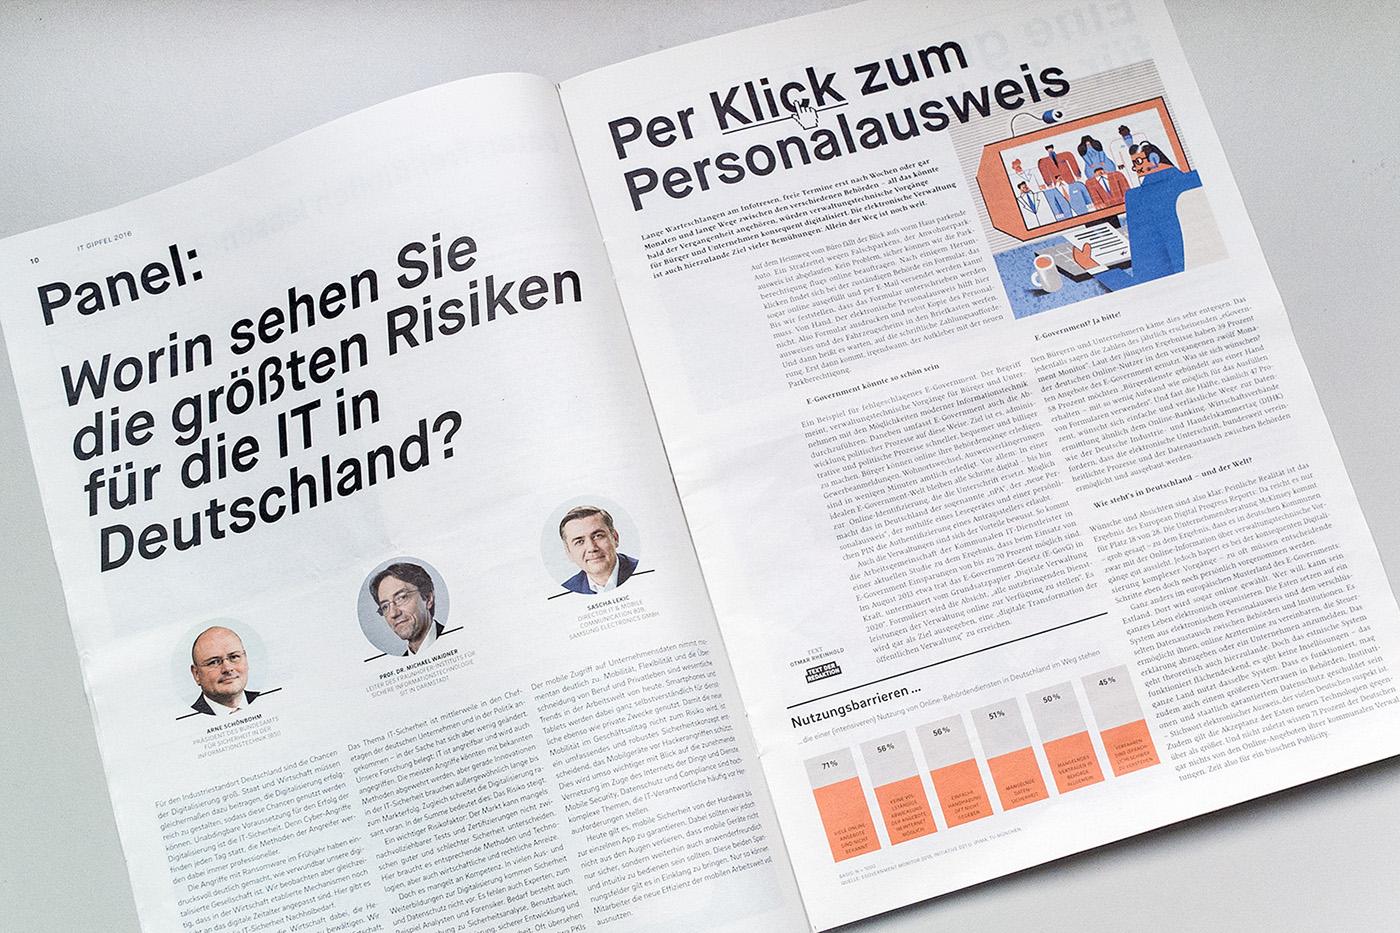 publicateur economics magazine Handelsblatt IT-Gipfel ILLUSTRATION  editorialdesign